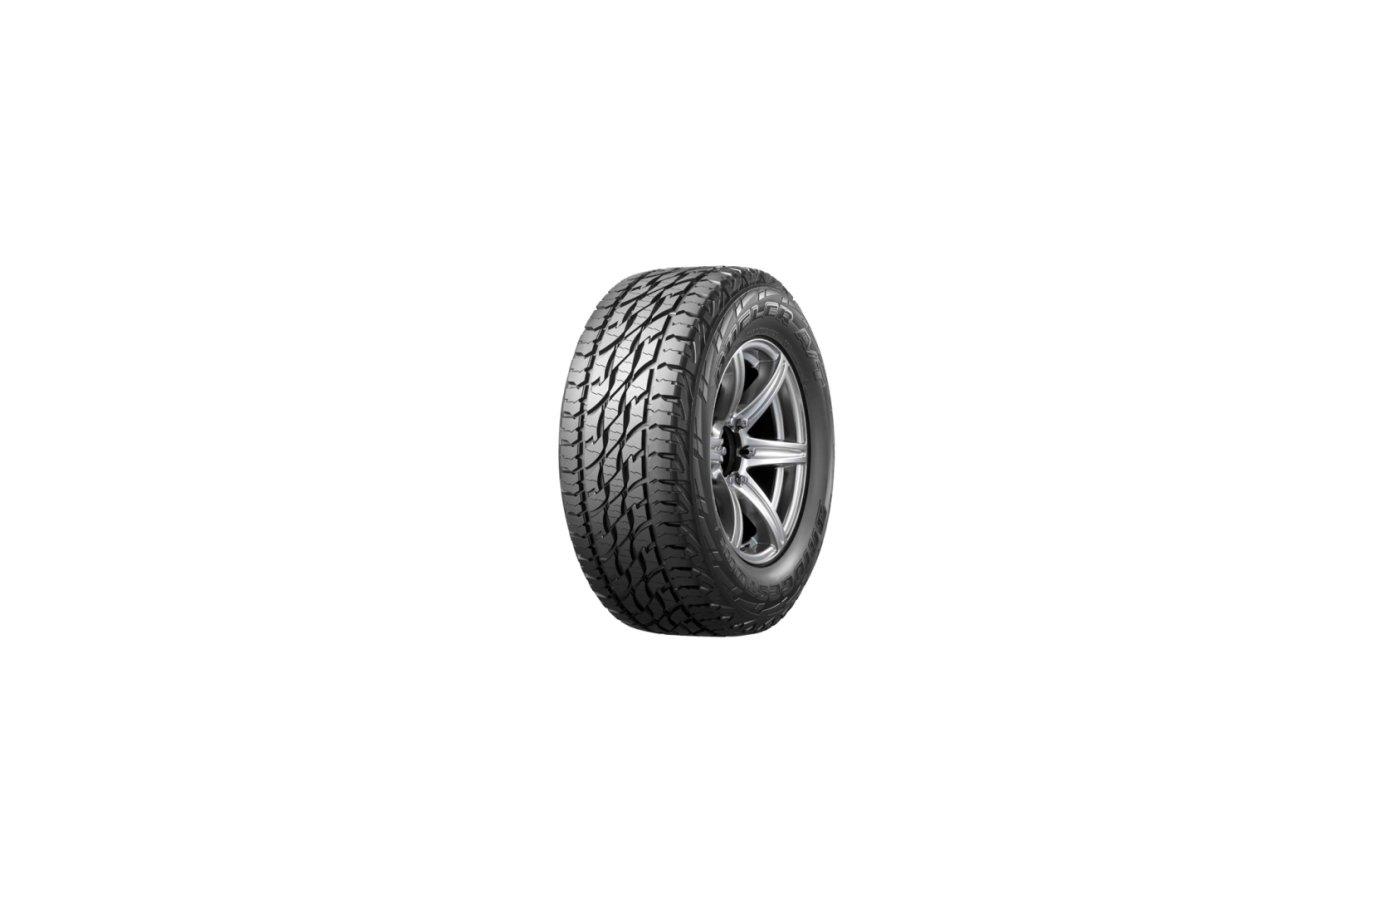 Шина Bridgestone Dueler A/T D697 30X9,5 R15 TL 104S OWT